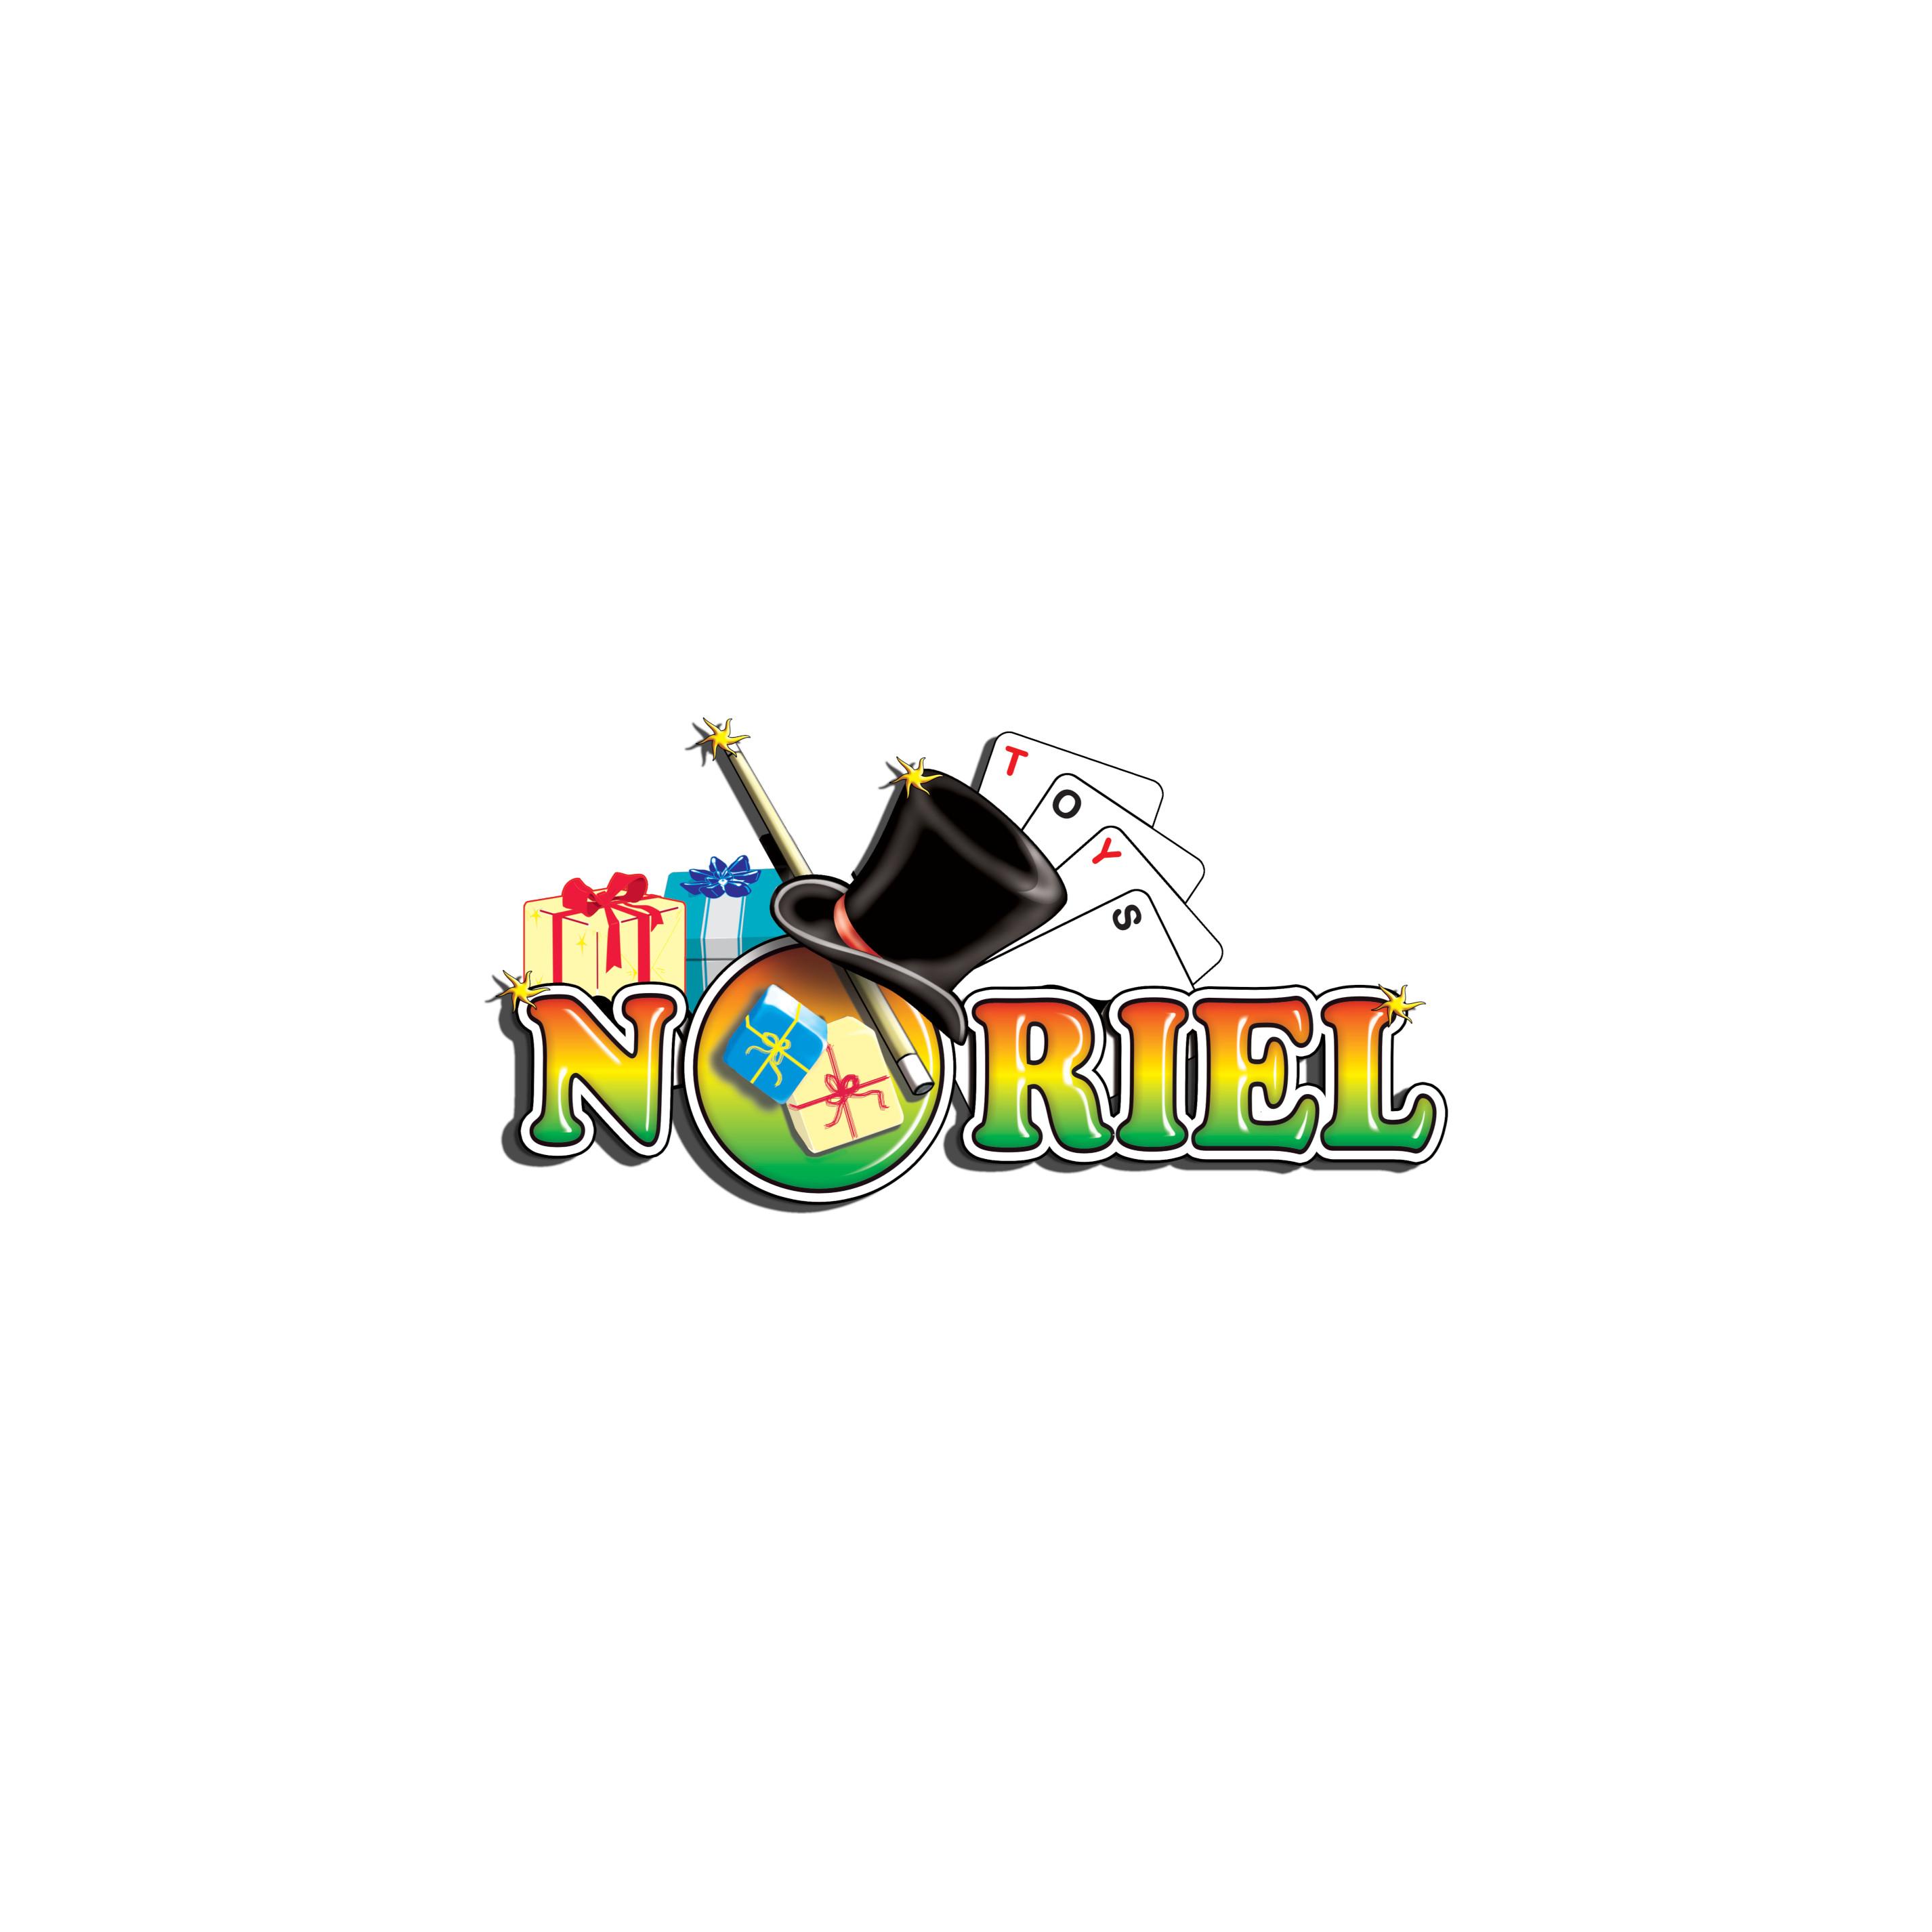 34110330 Fular de baieti Minoti Skate, Multicolor